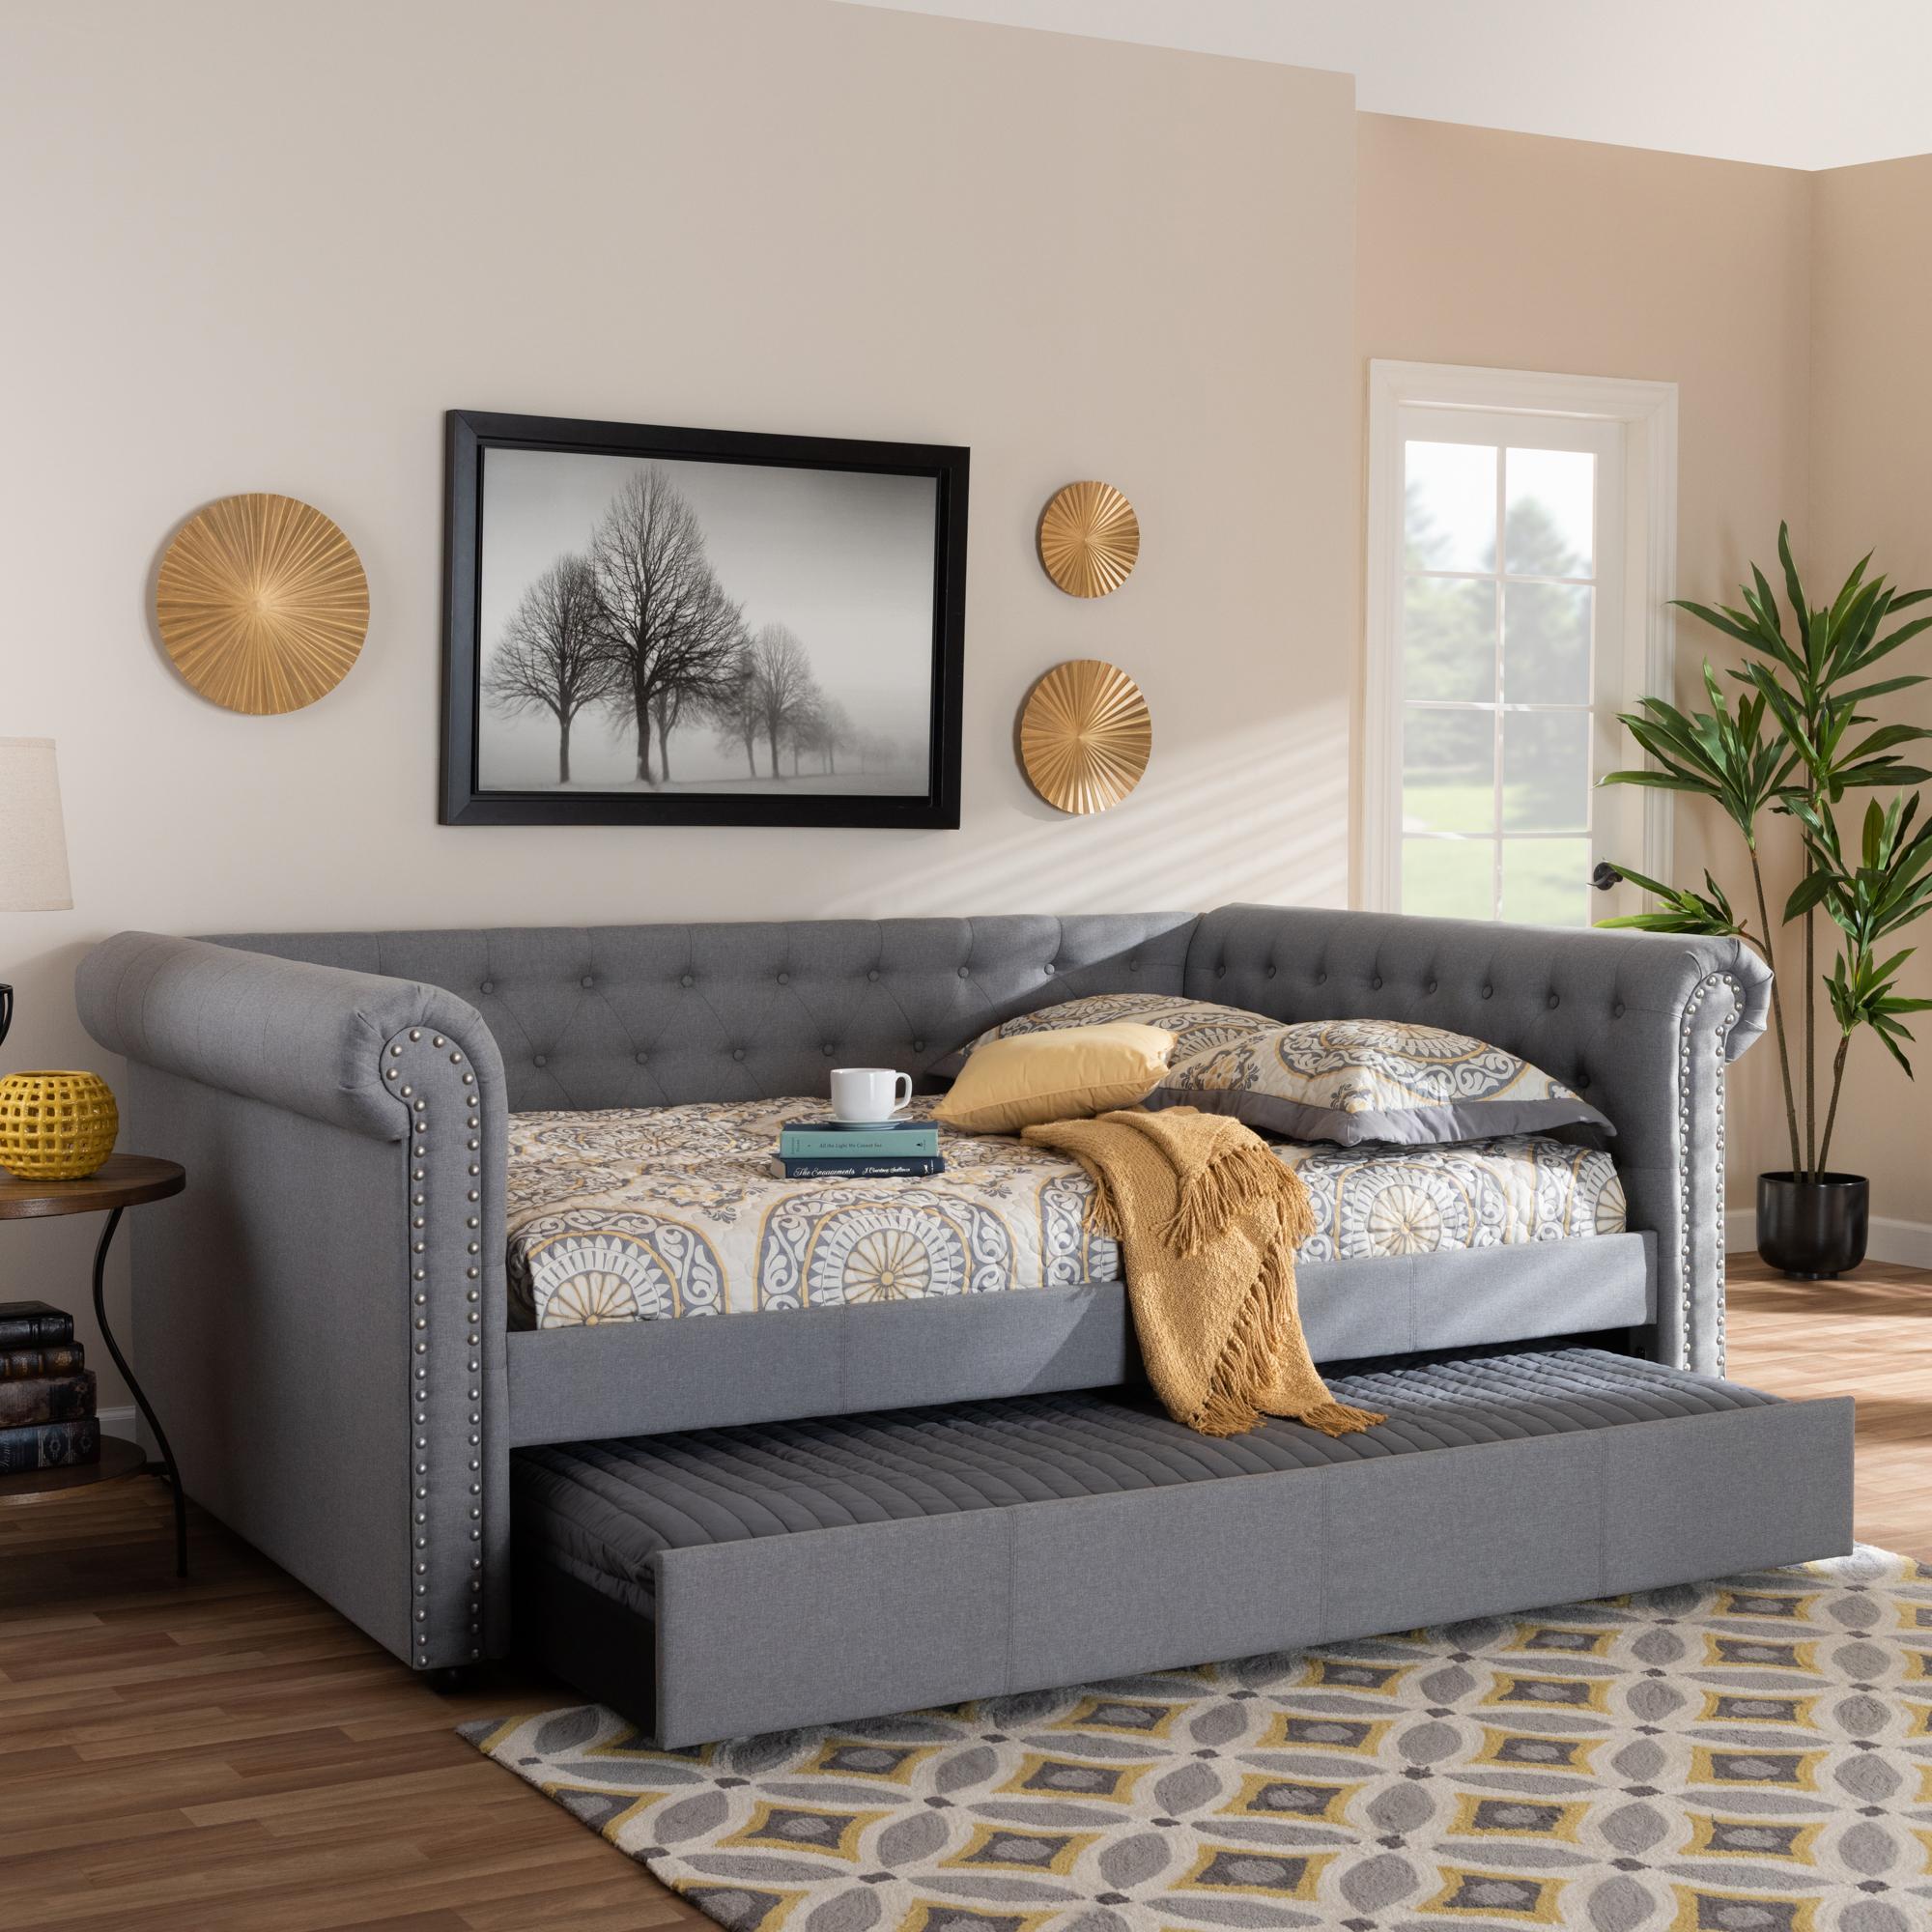 - Wholesale Queen Wholesale Bedroom Furniture Wholesale Furniture